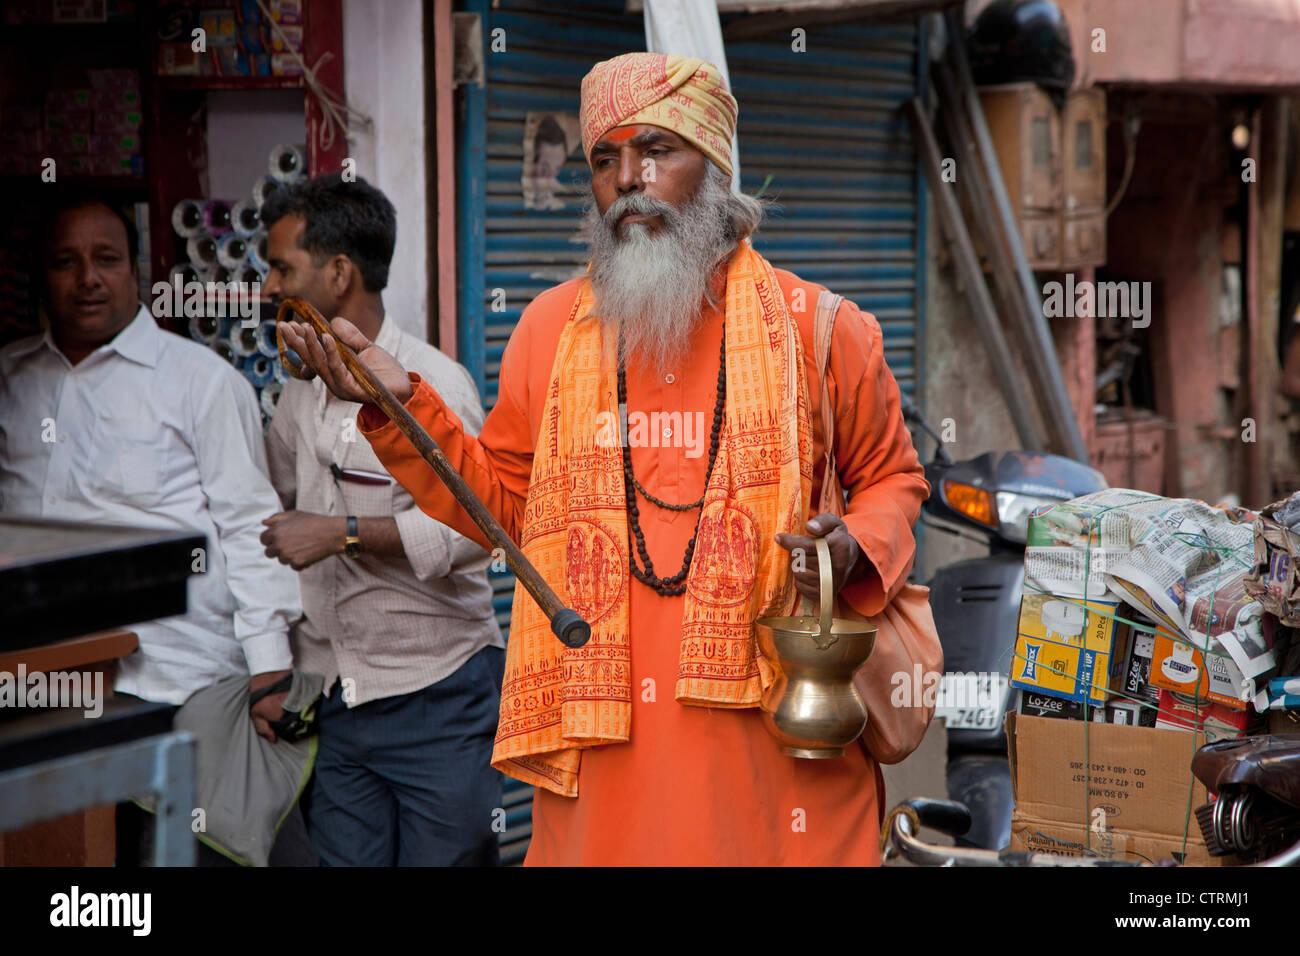 Galet de Hare Krishna dans les rues de Jaipur, Rajasthan, Inde Banque D'Images